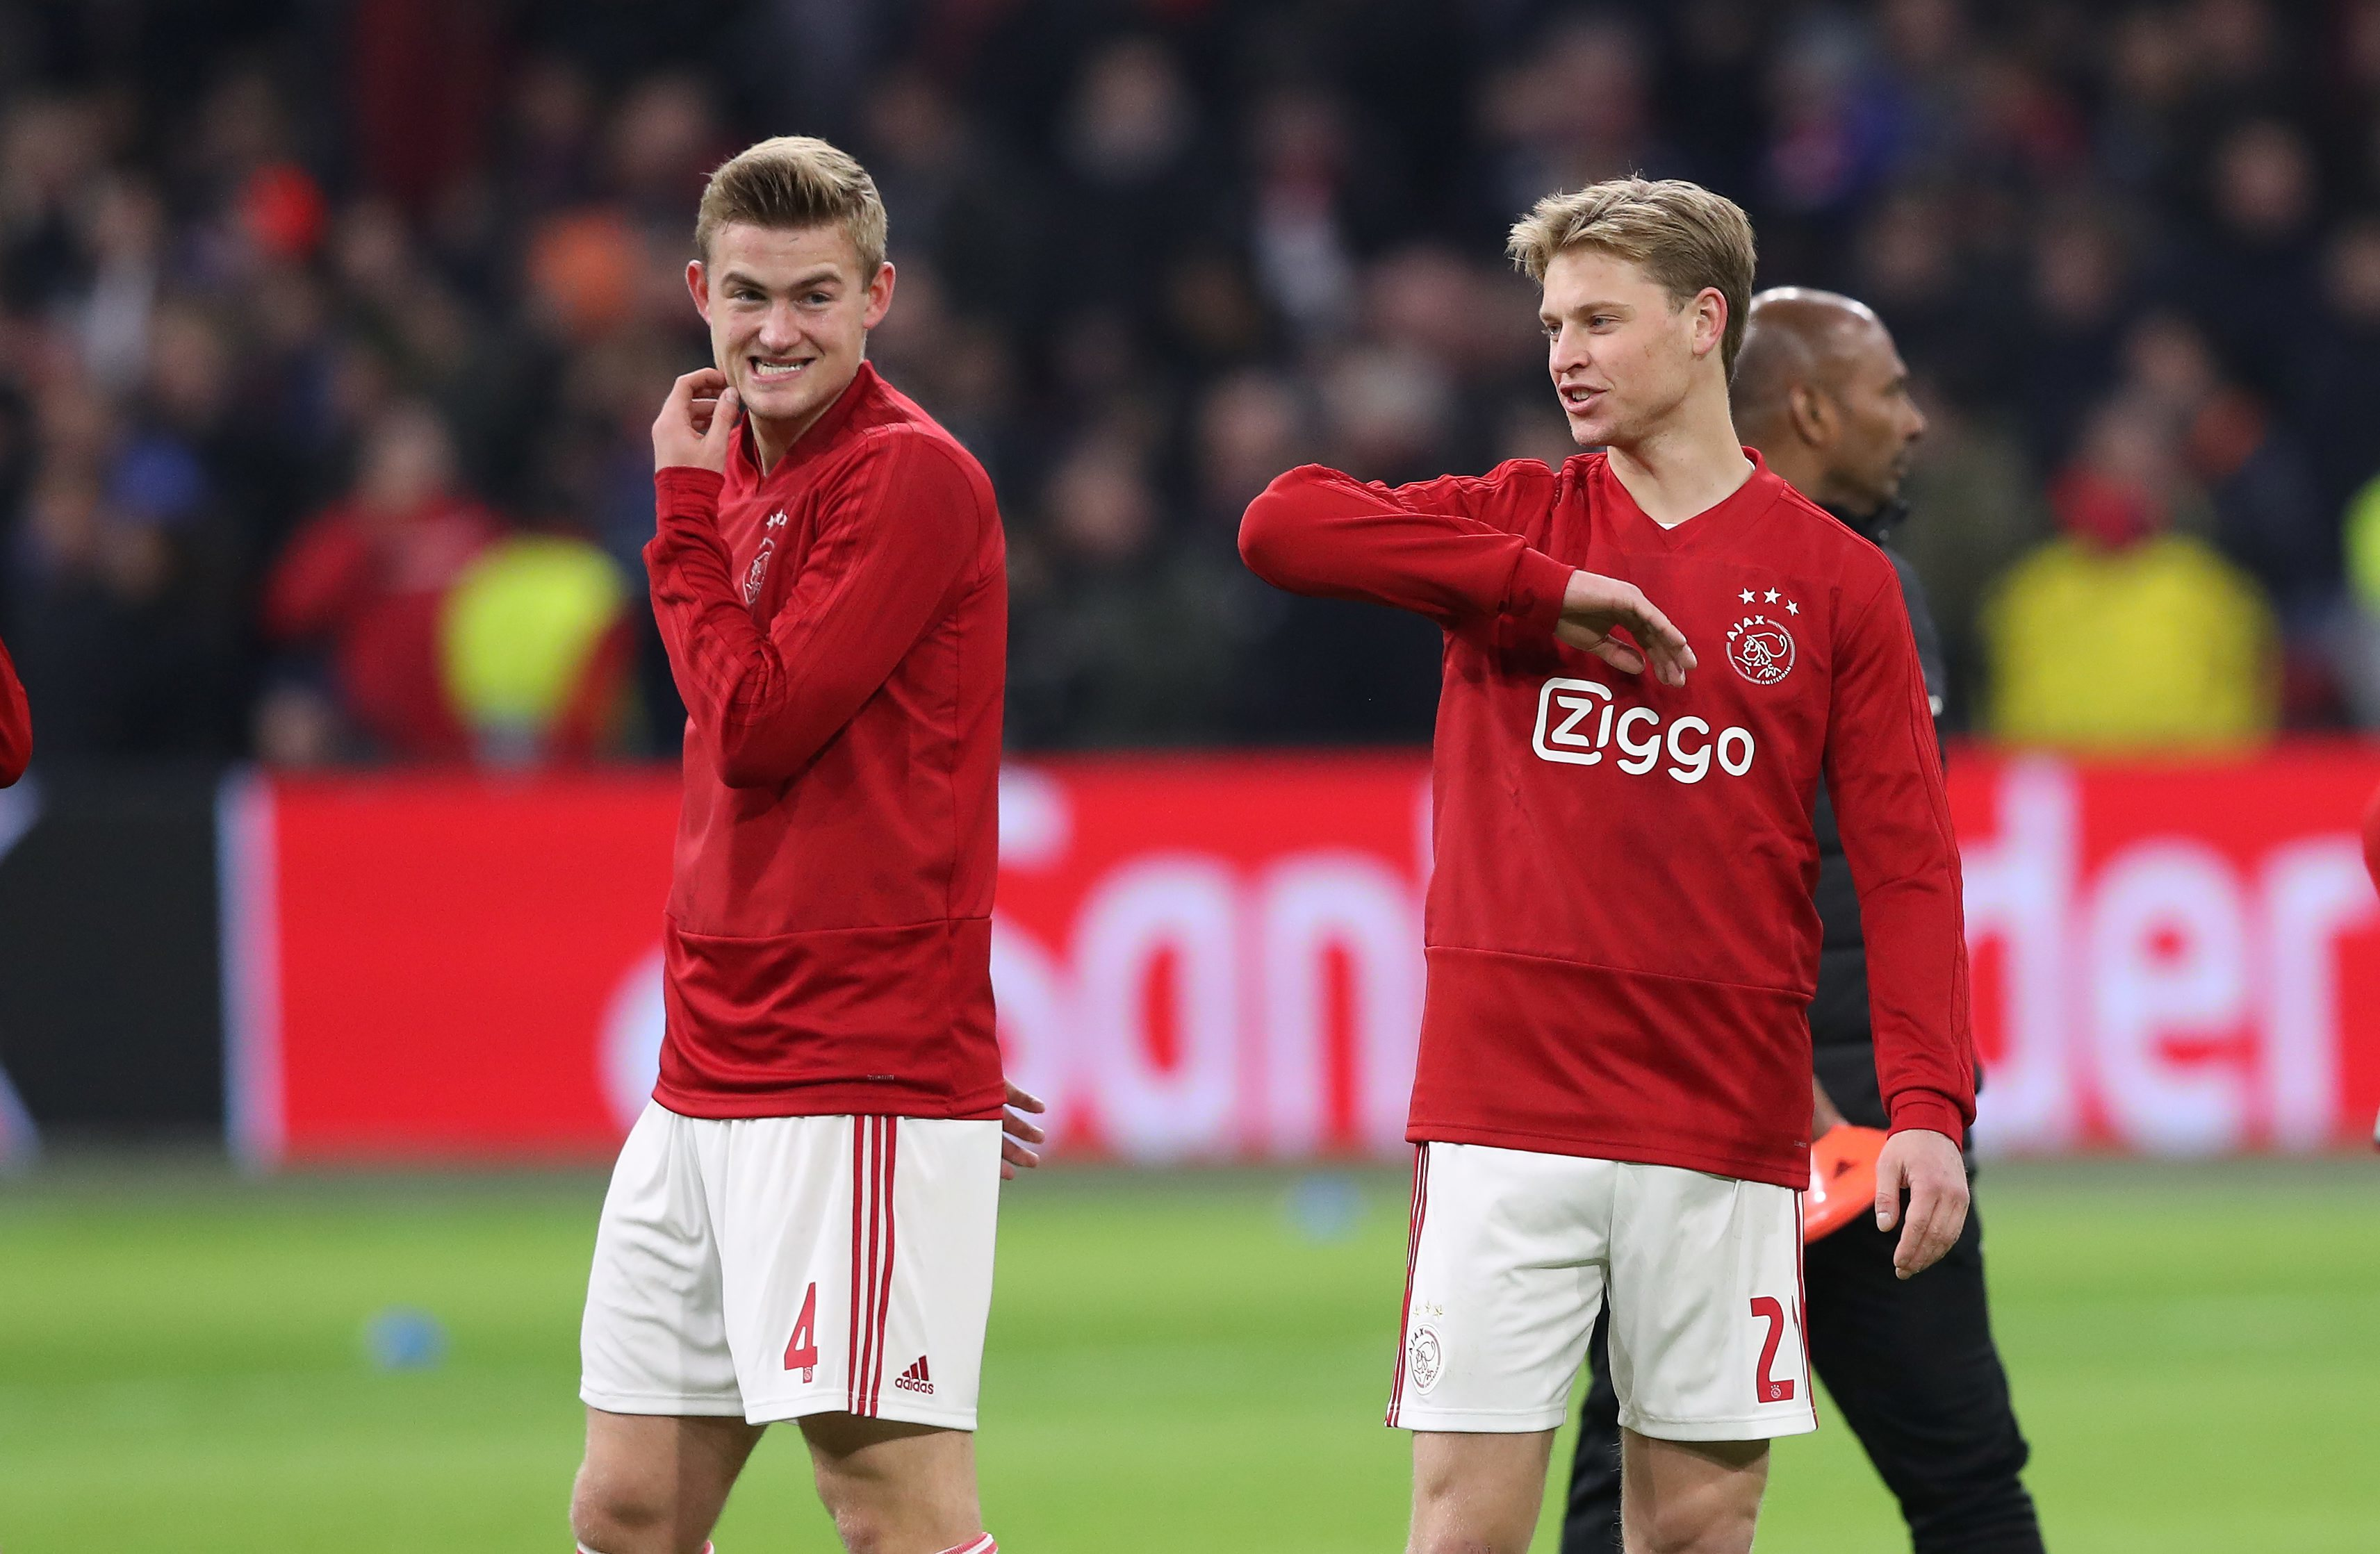 De Jong and De Ligt look set to continue as teammates. Image: PA Images